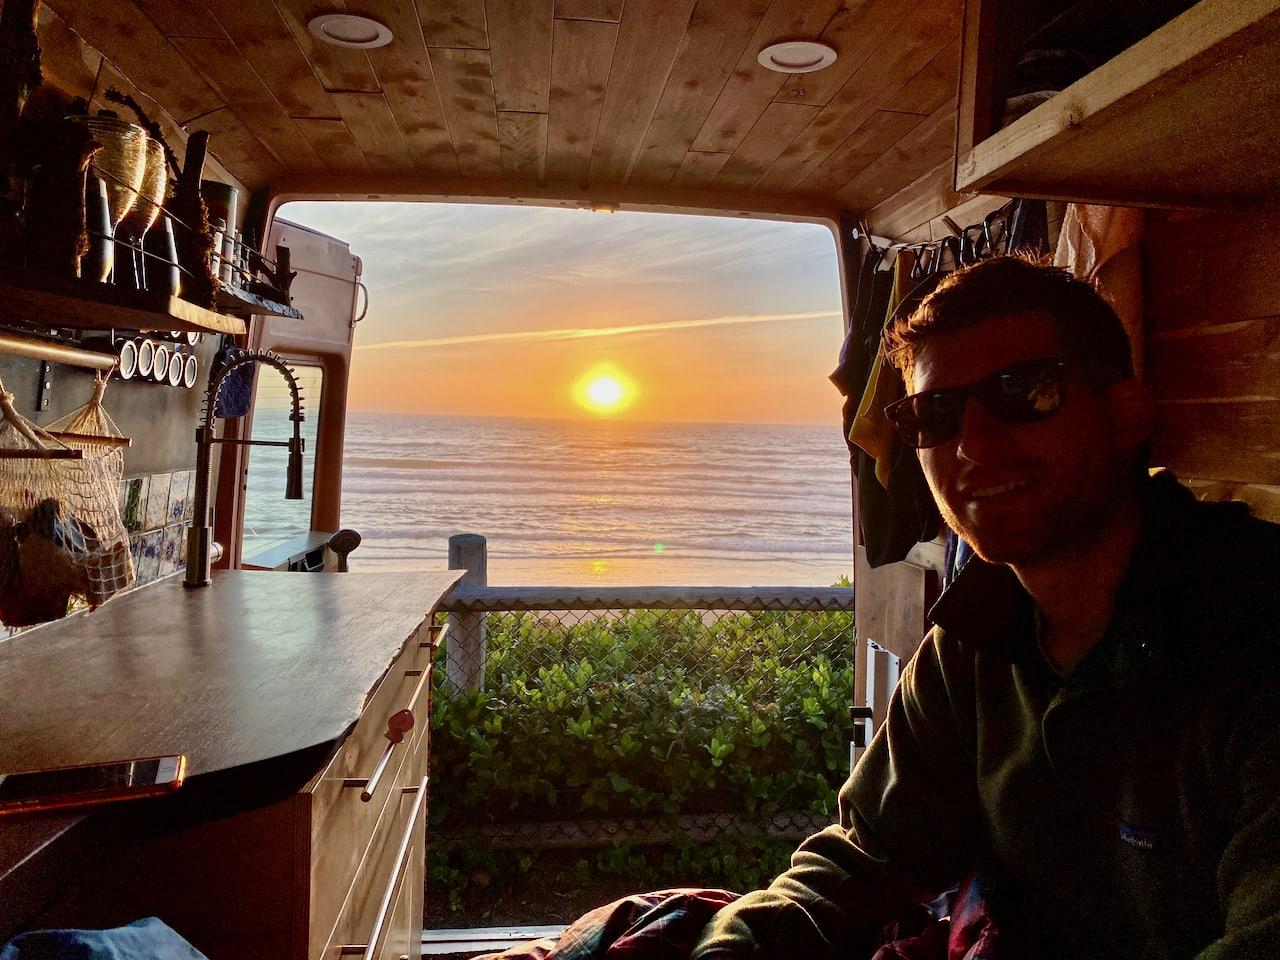 Sunset @ Oregon coast. Dodge Sprinter 2004